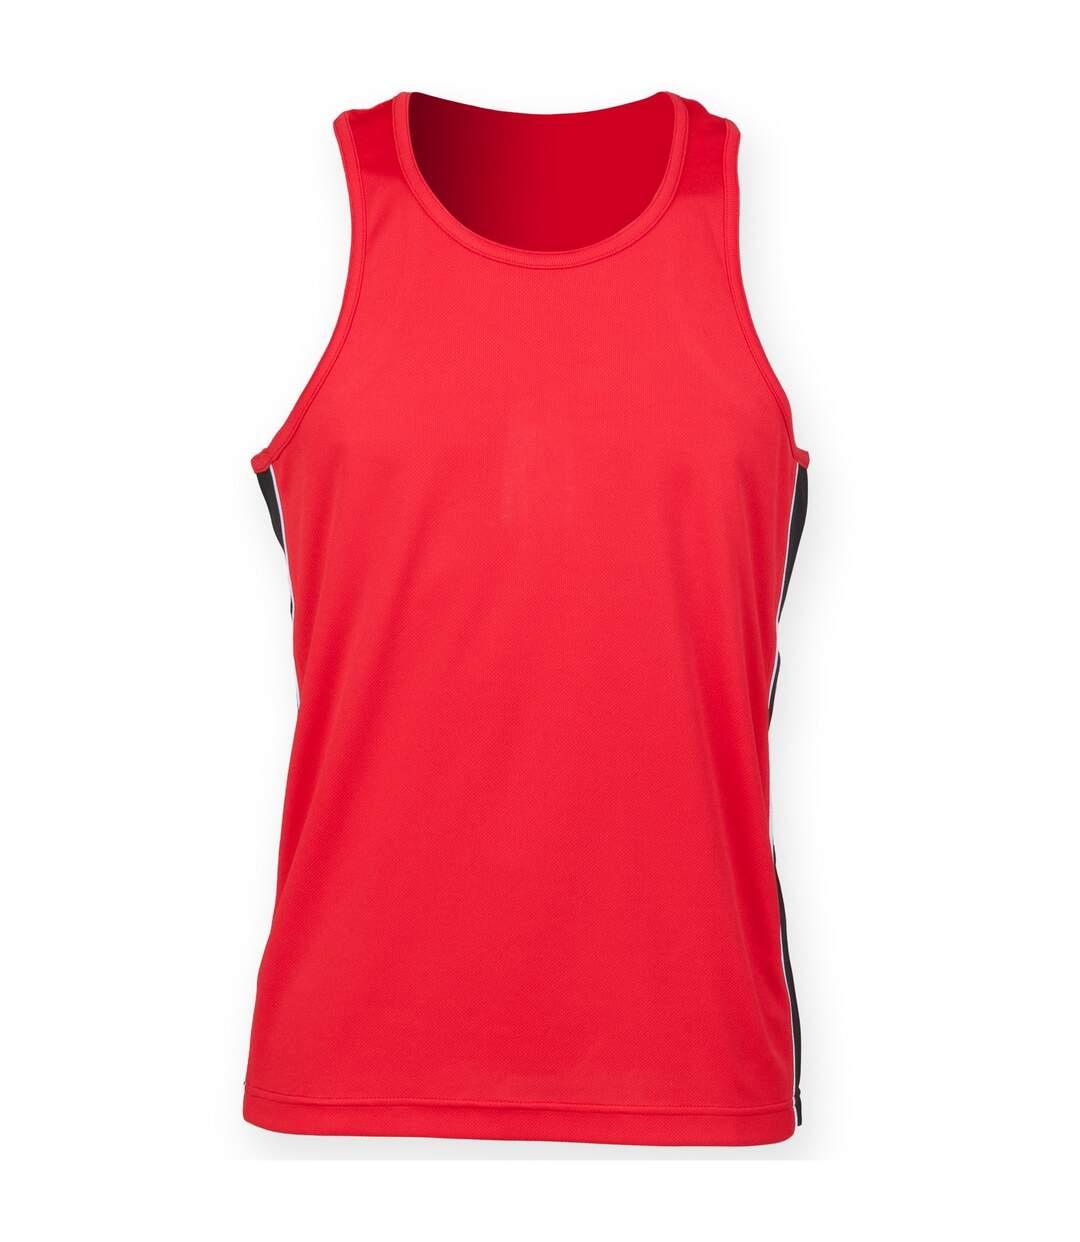 Finden & Hales Mens Performance Panel Moisture Wicking Sports Vest Top (Black/Red/White) - UTRW4688